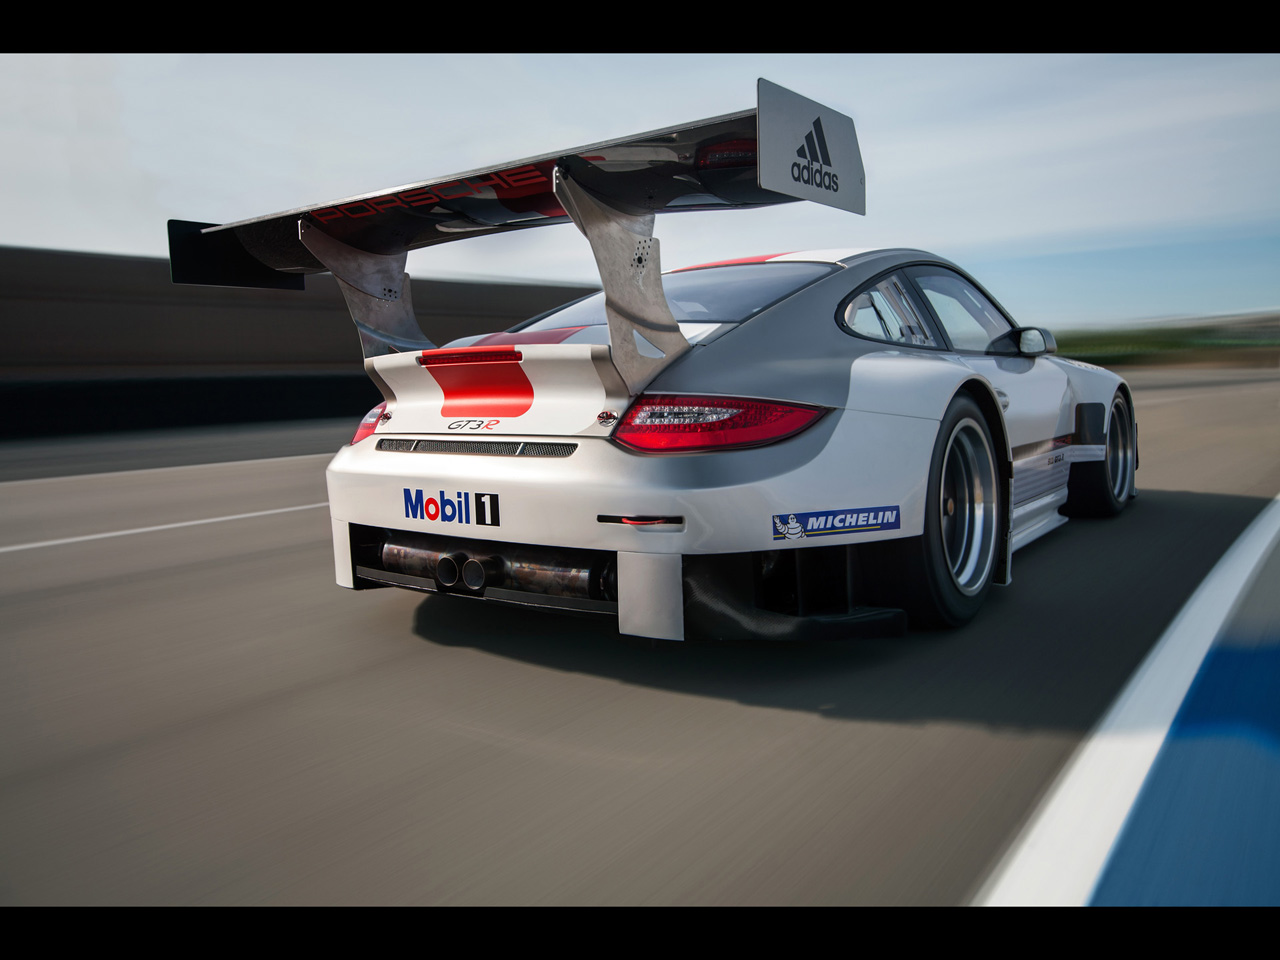 2013 Porsche 911 GT3 R Motion 5 Porsche 911 GT3 R